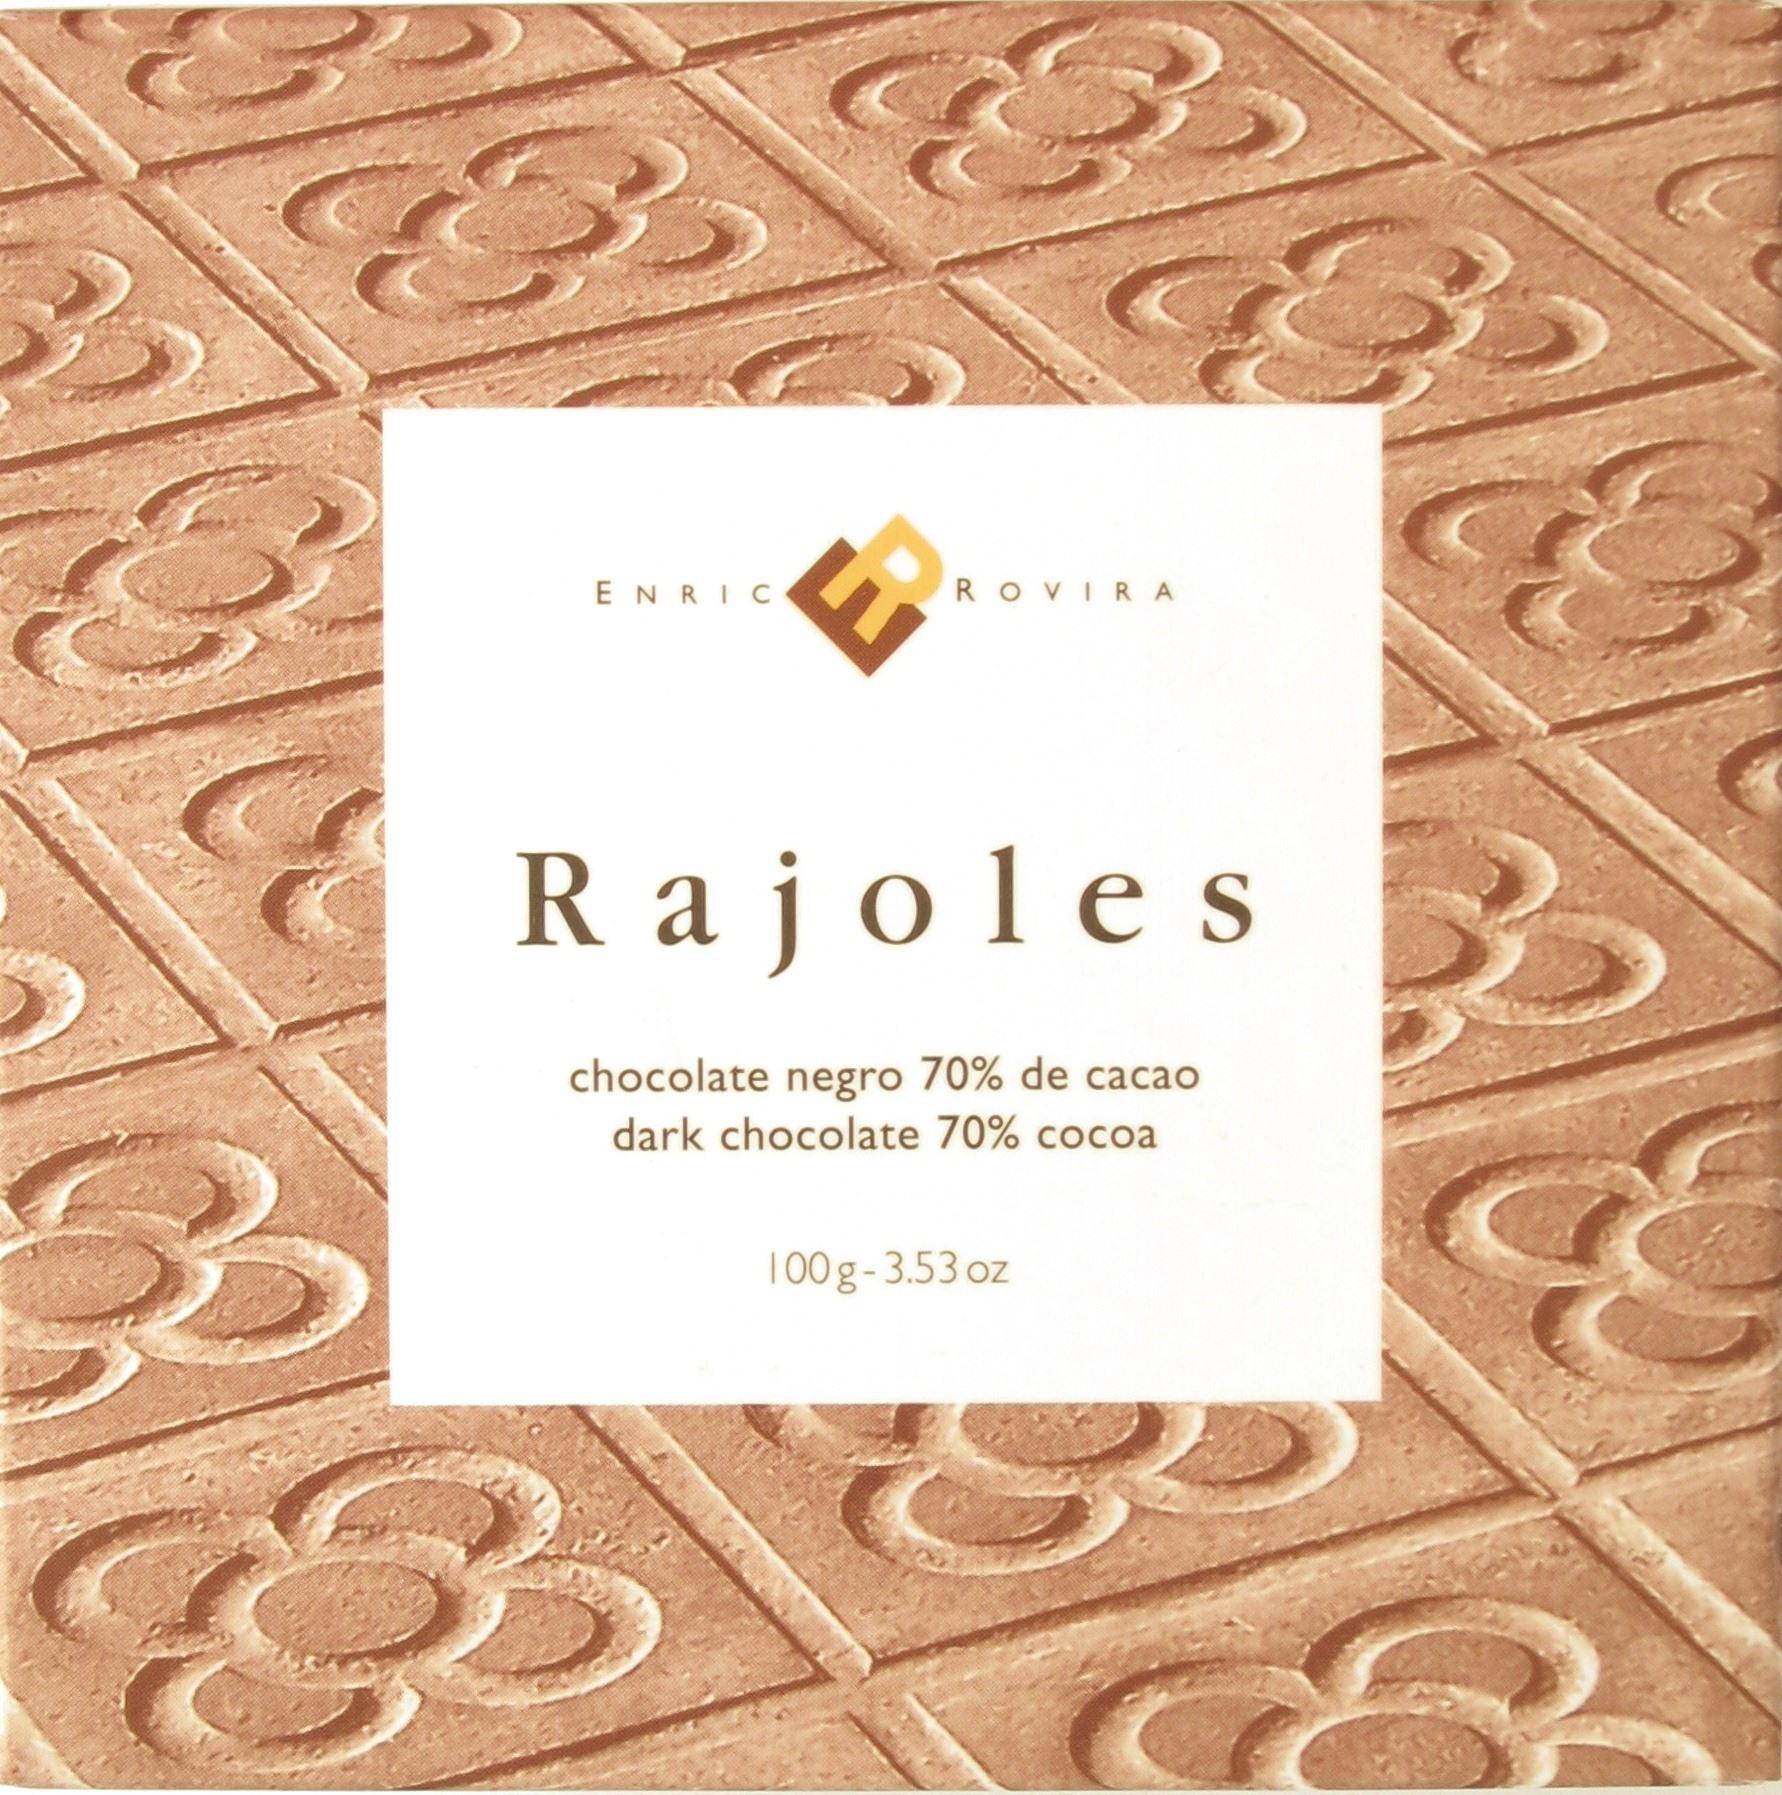 Dunkle Tafelschokolade Enric Rovira, Barcelona